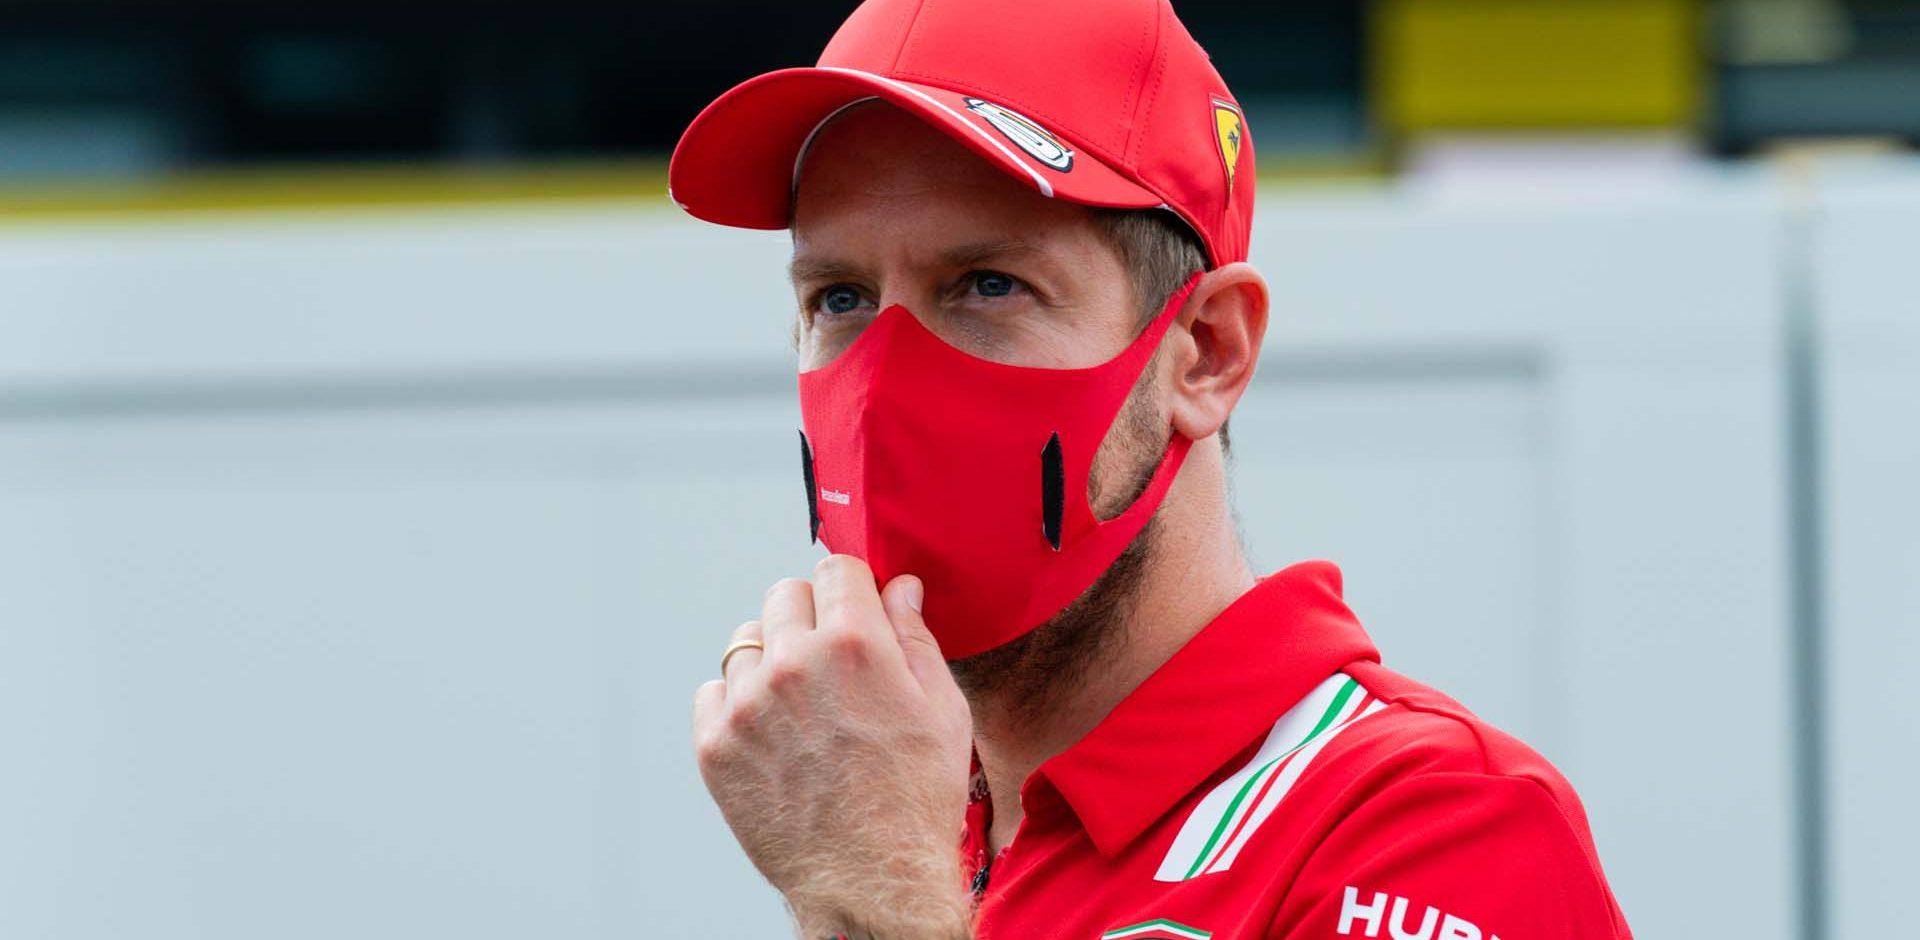 GP TOSCANA FERRARI 1000 F1/2020 -  GIOVEDÌ 10/09/2020   credit: @Scuderia Ferrari Press Office Sebastian Vettel